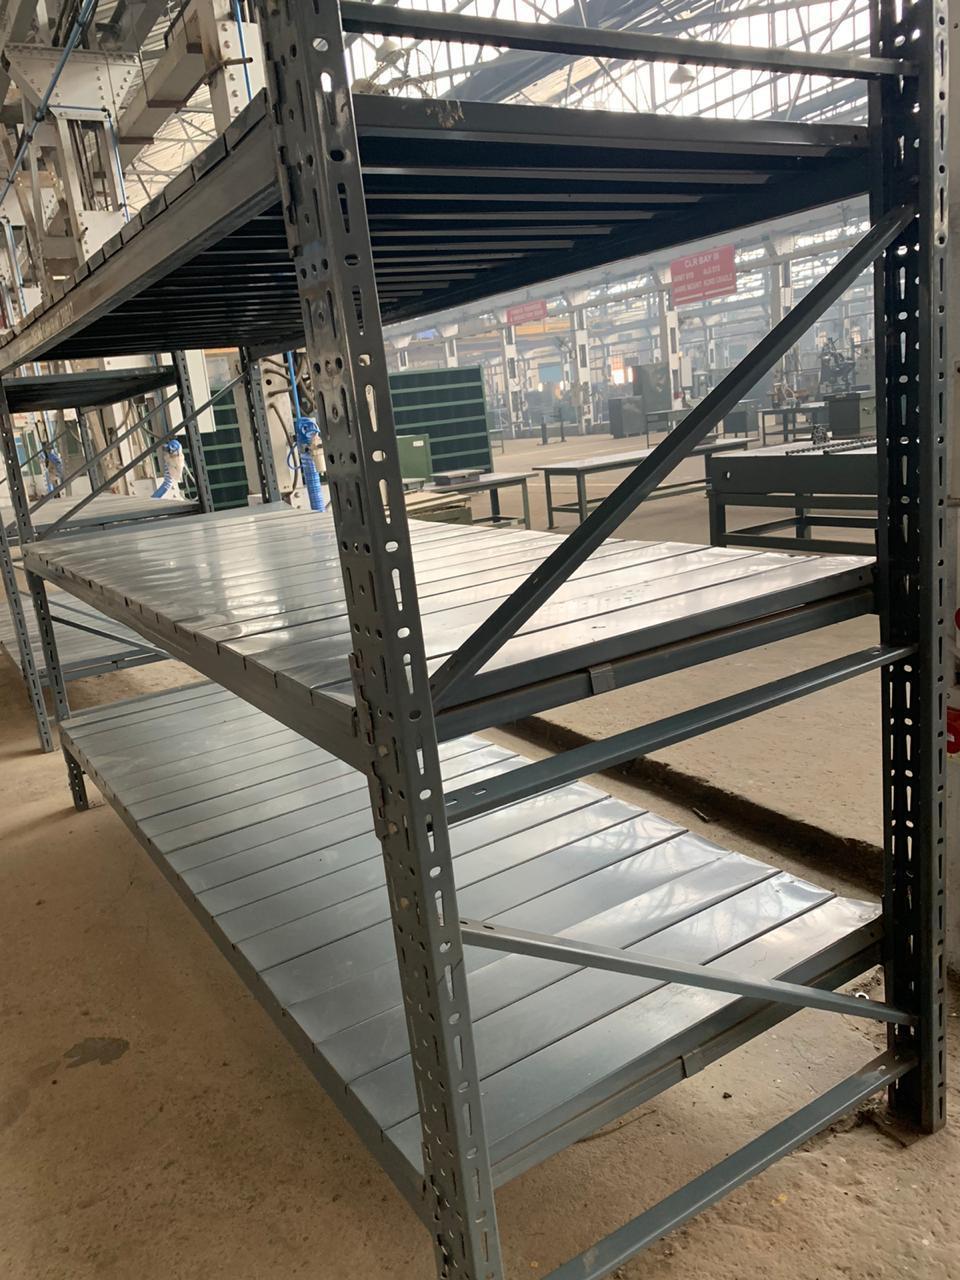 Commercial heavy duty rack